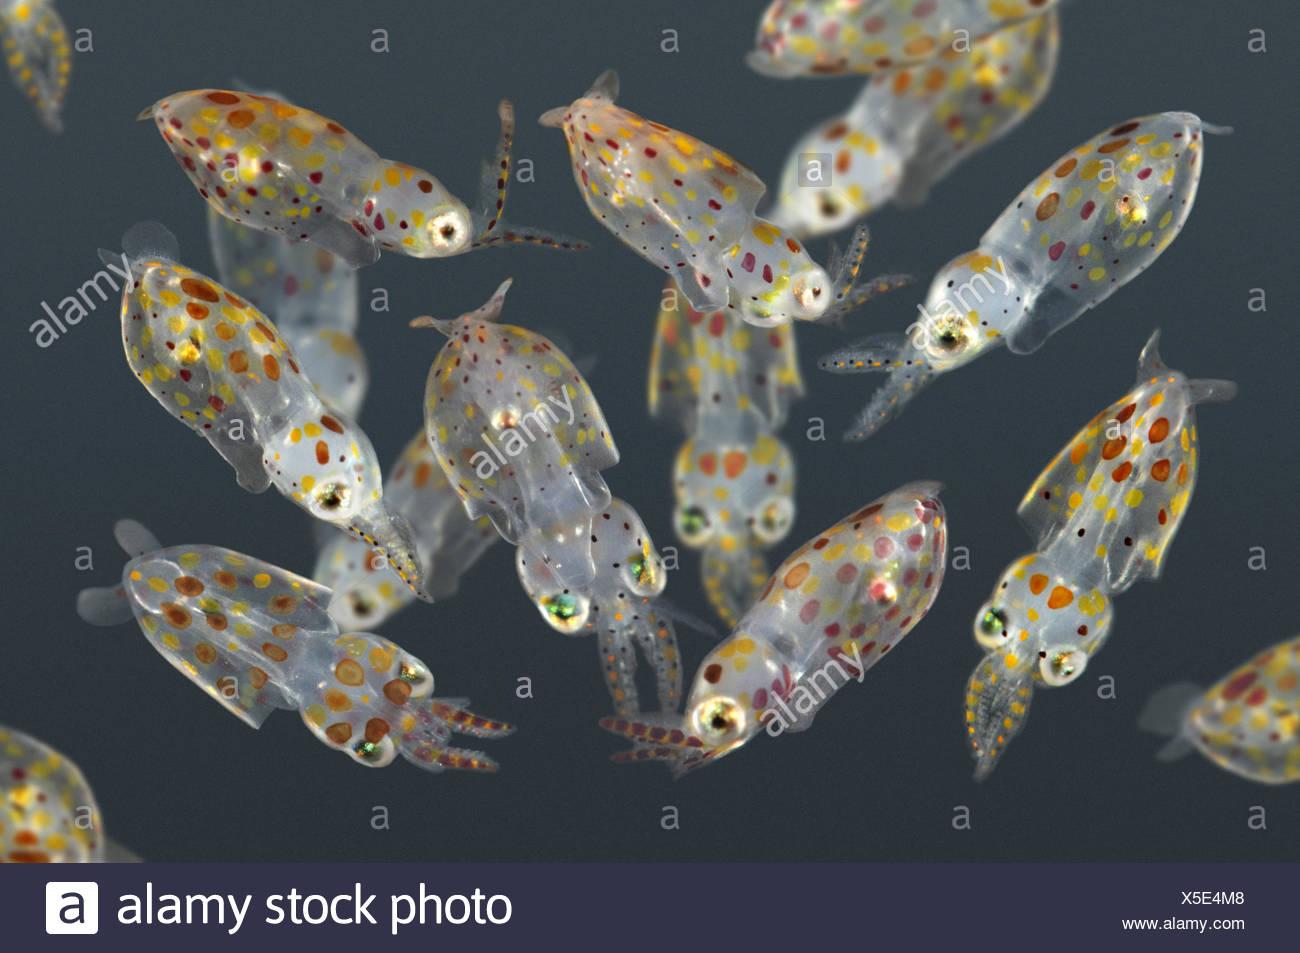 Young Common Squid - Loligo vulgaris - Stock Image